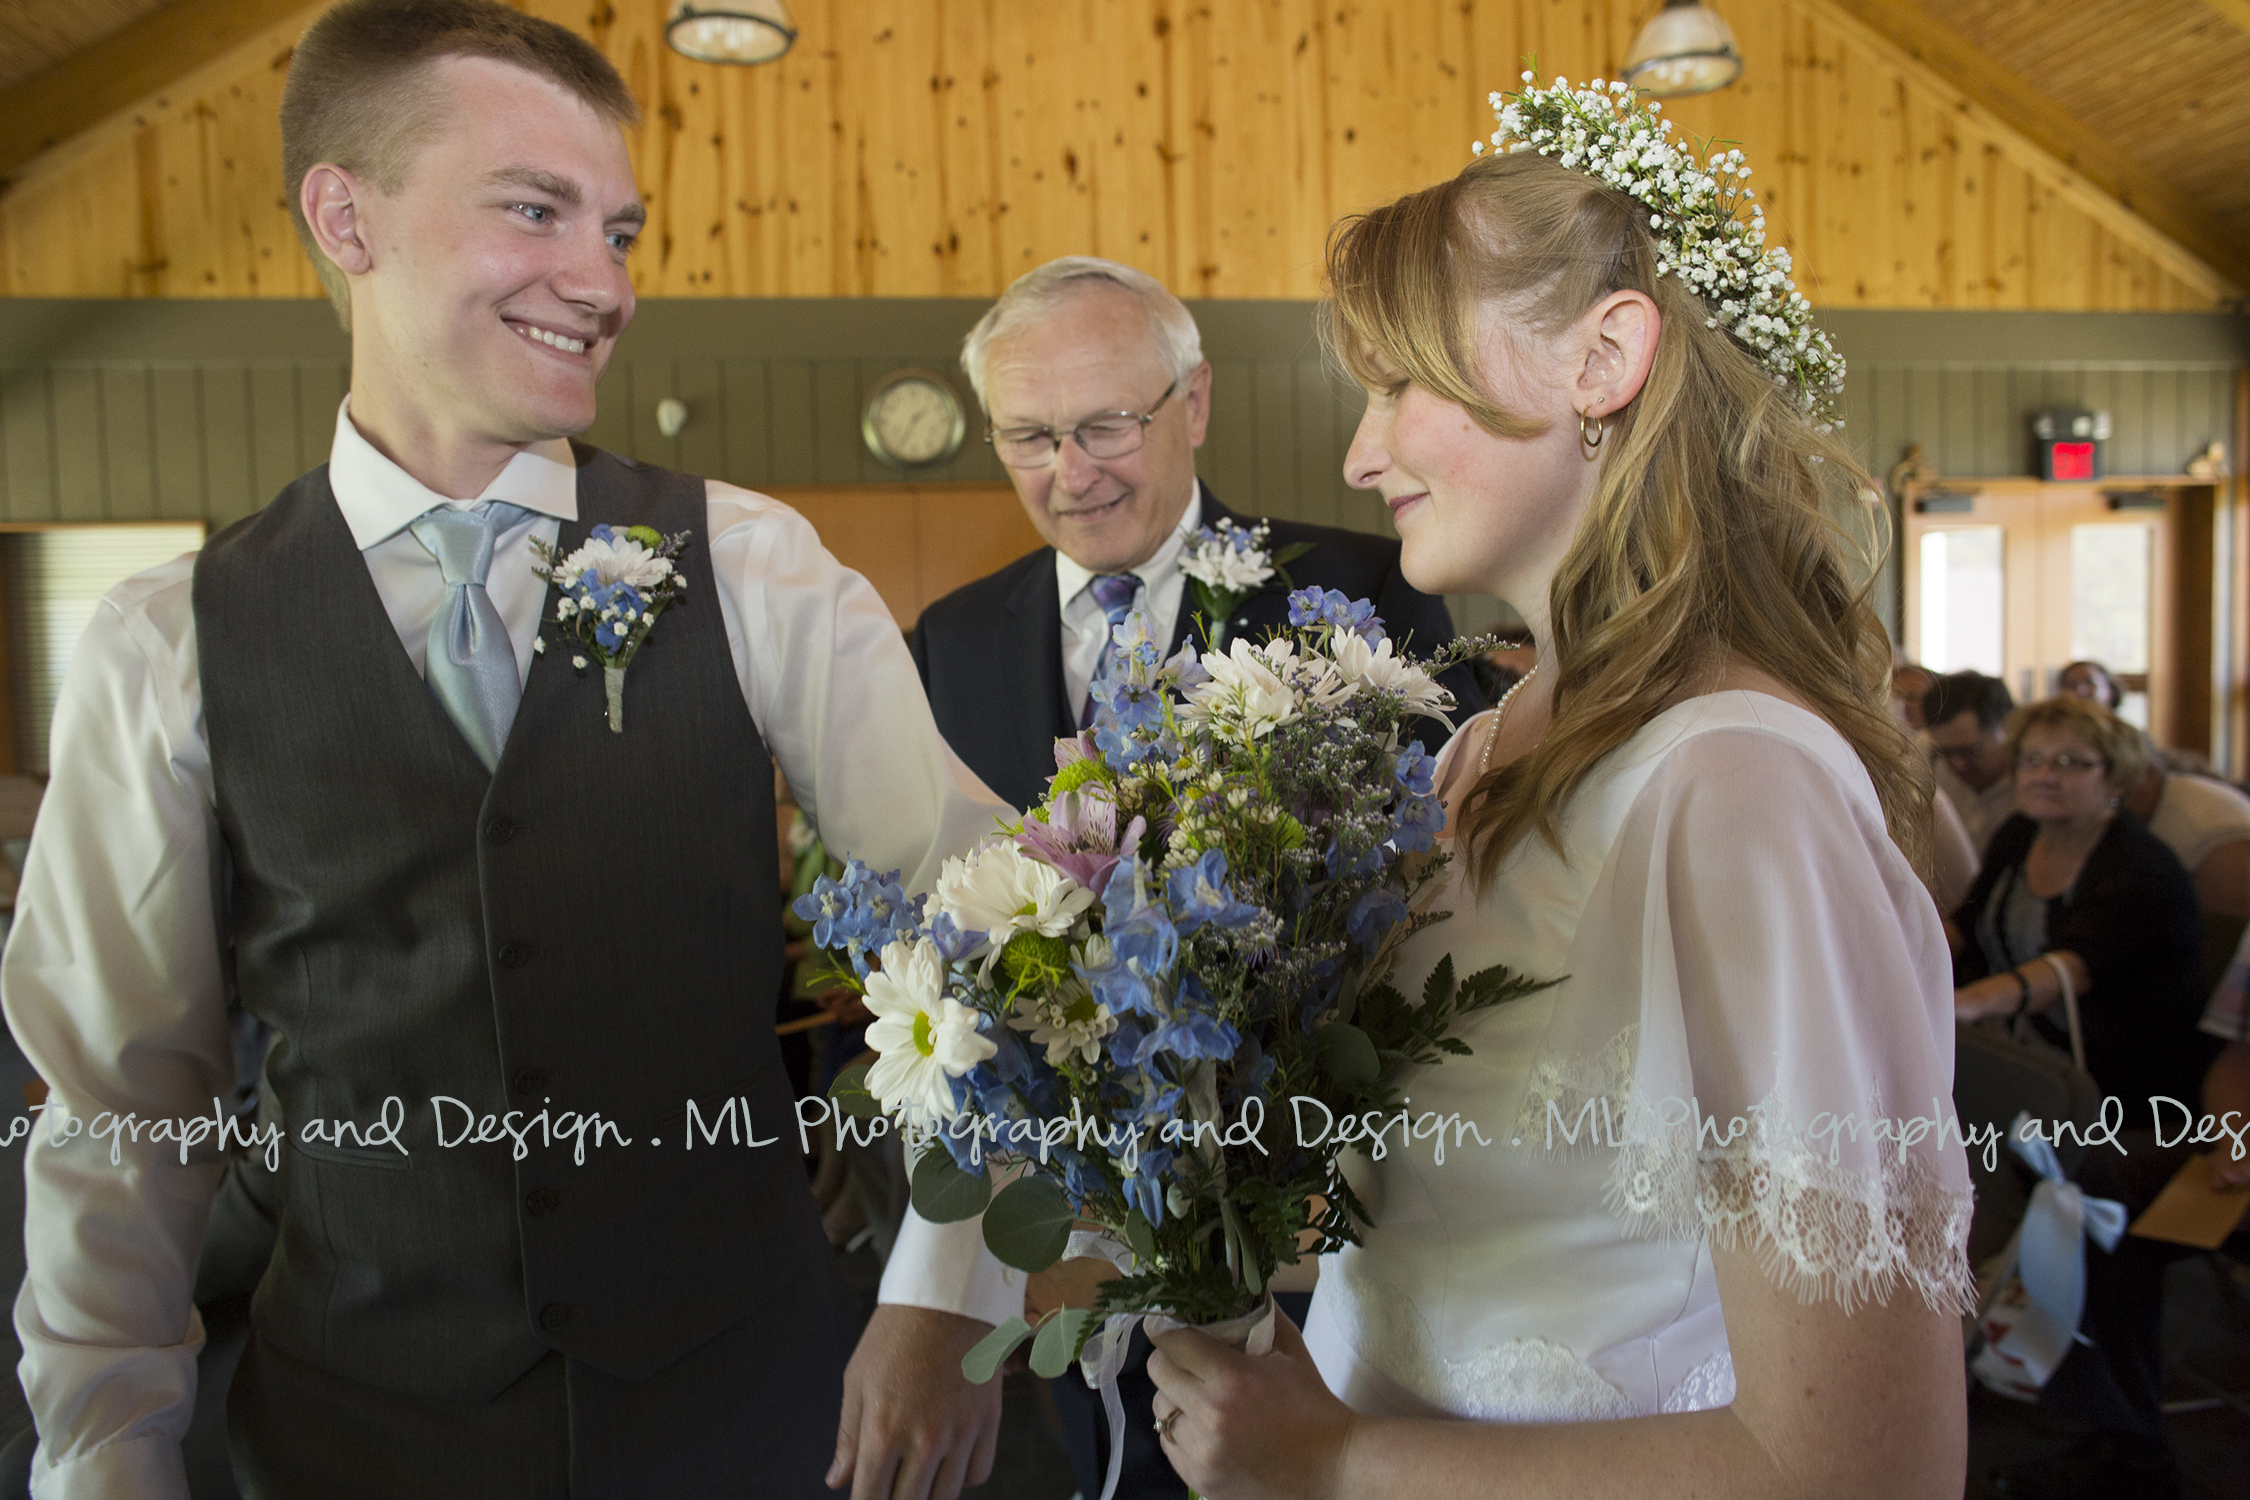 Lac-Lawrann-Conservancy-Wedding-24.jpg